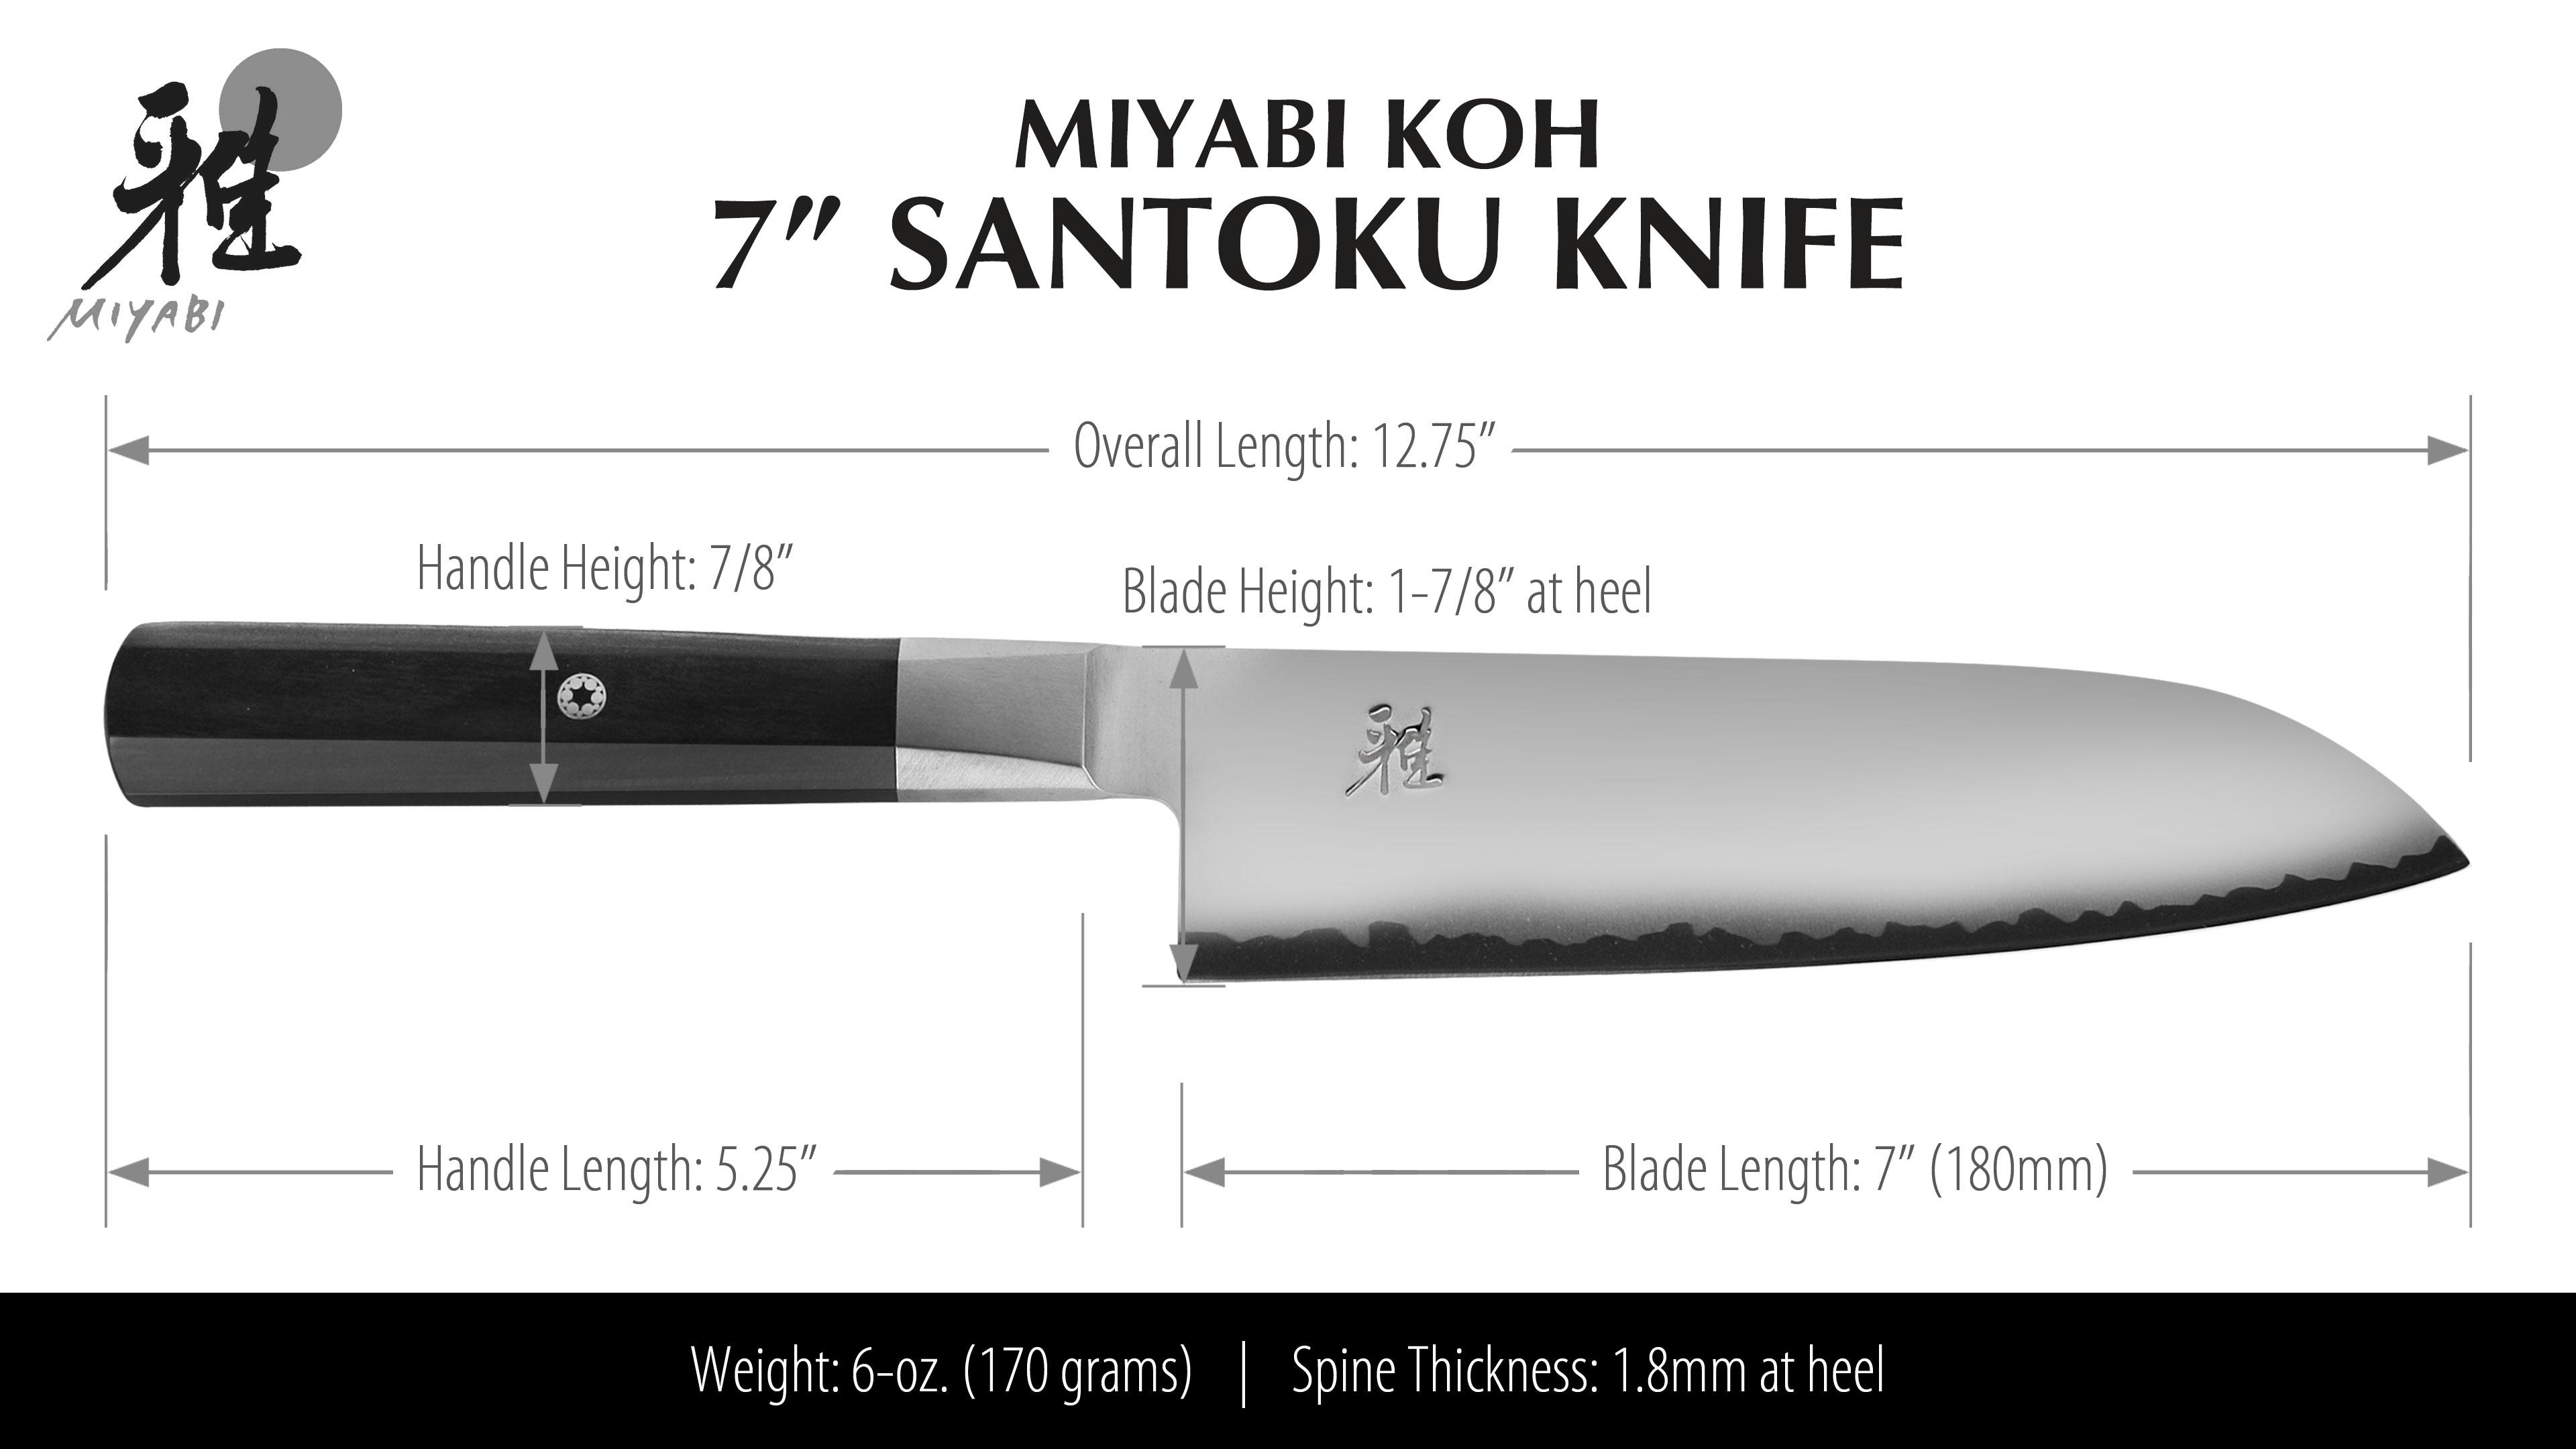 Miyabi Koh Santoku Knife 7 Cutlery And More